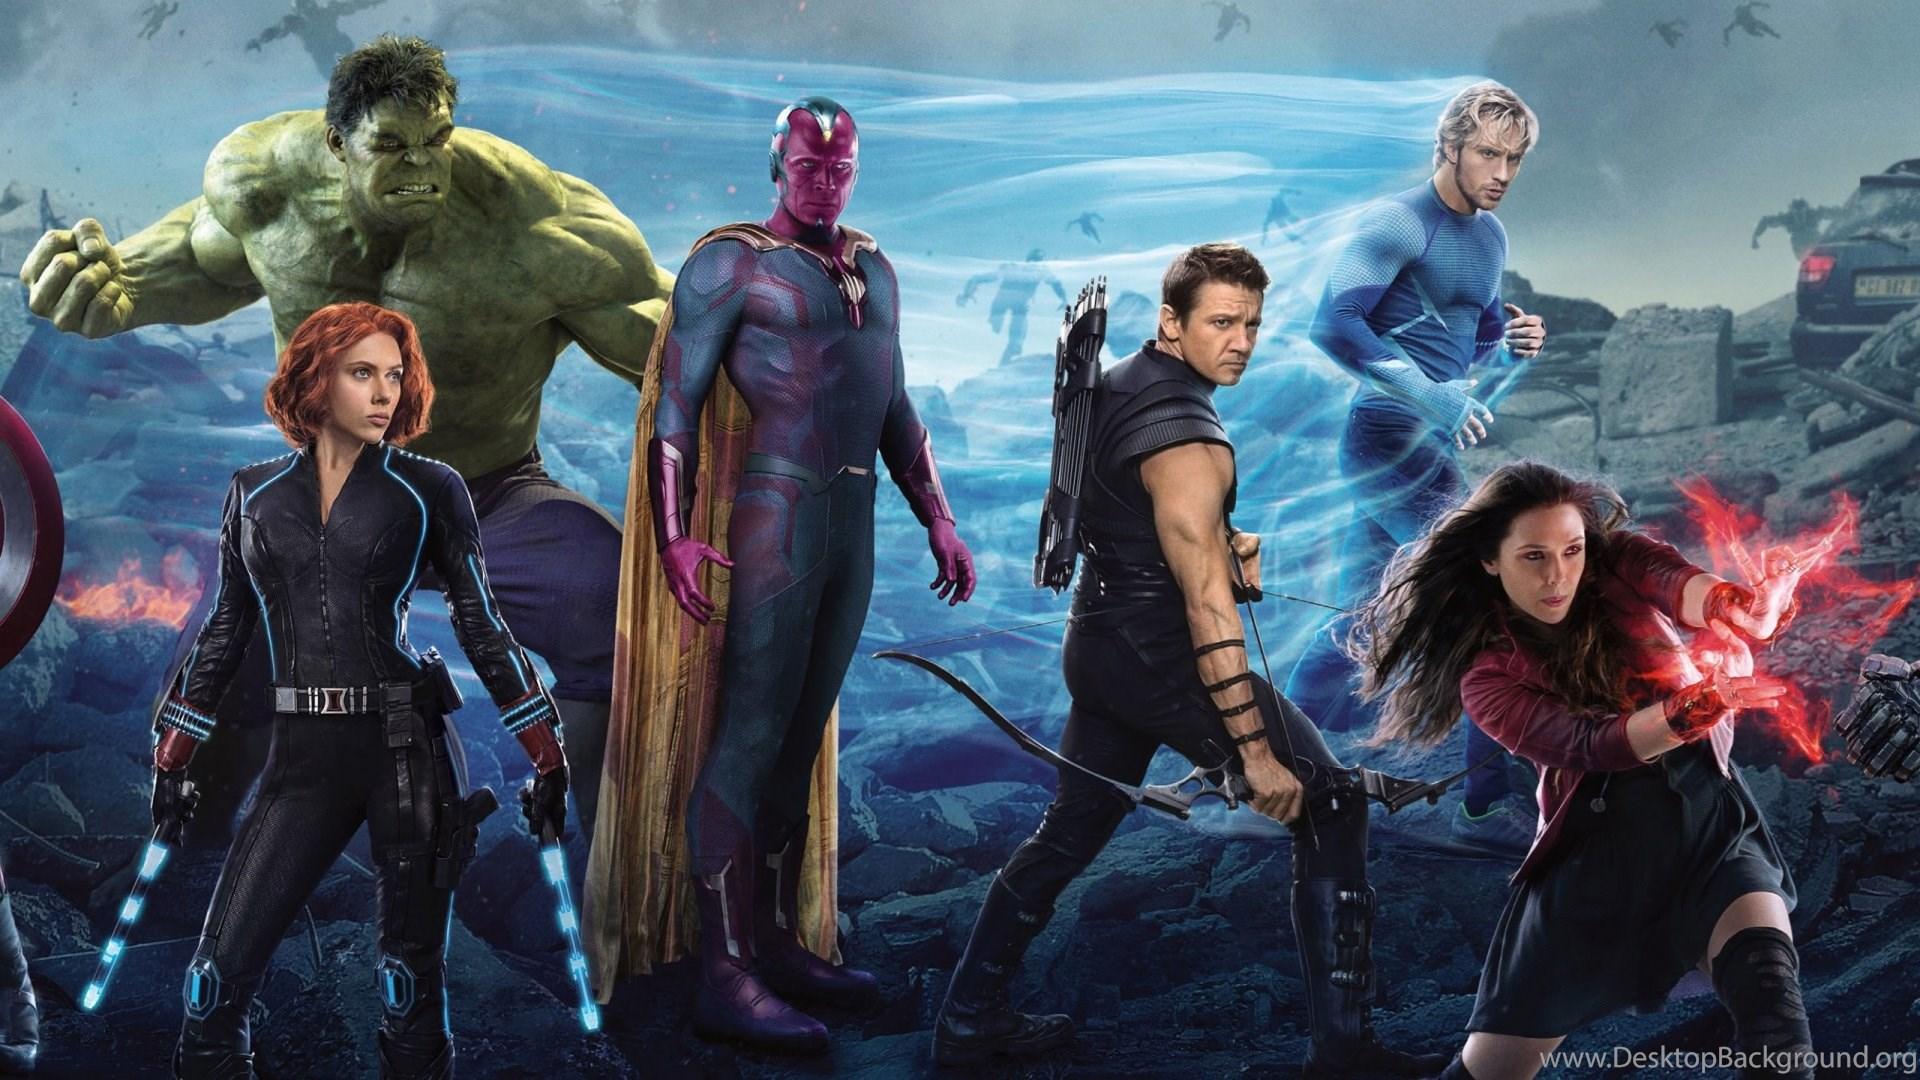 Team Avengers Hd Wallpapers Desktop Background